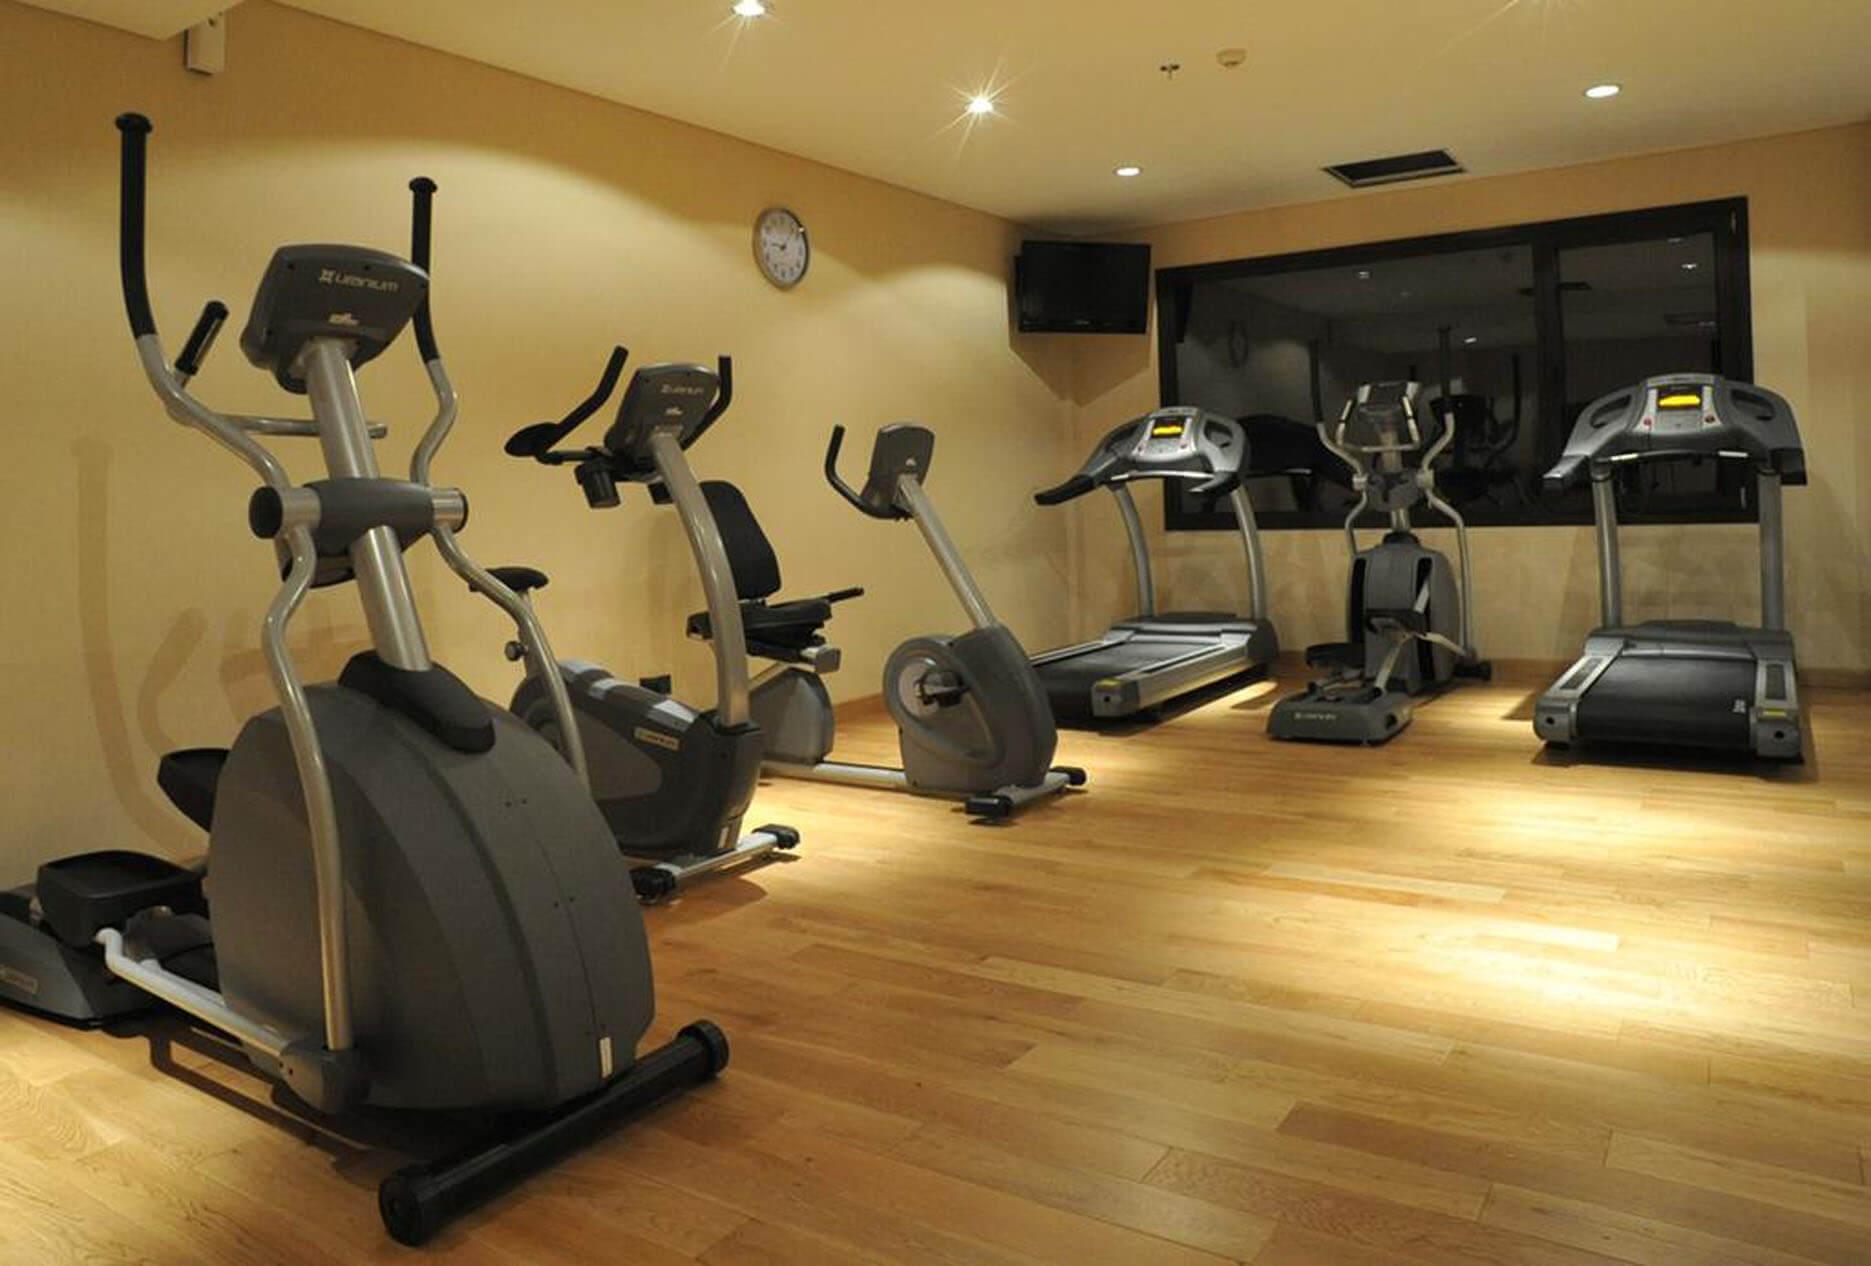 Hinn Ezeiza Fitness Center